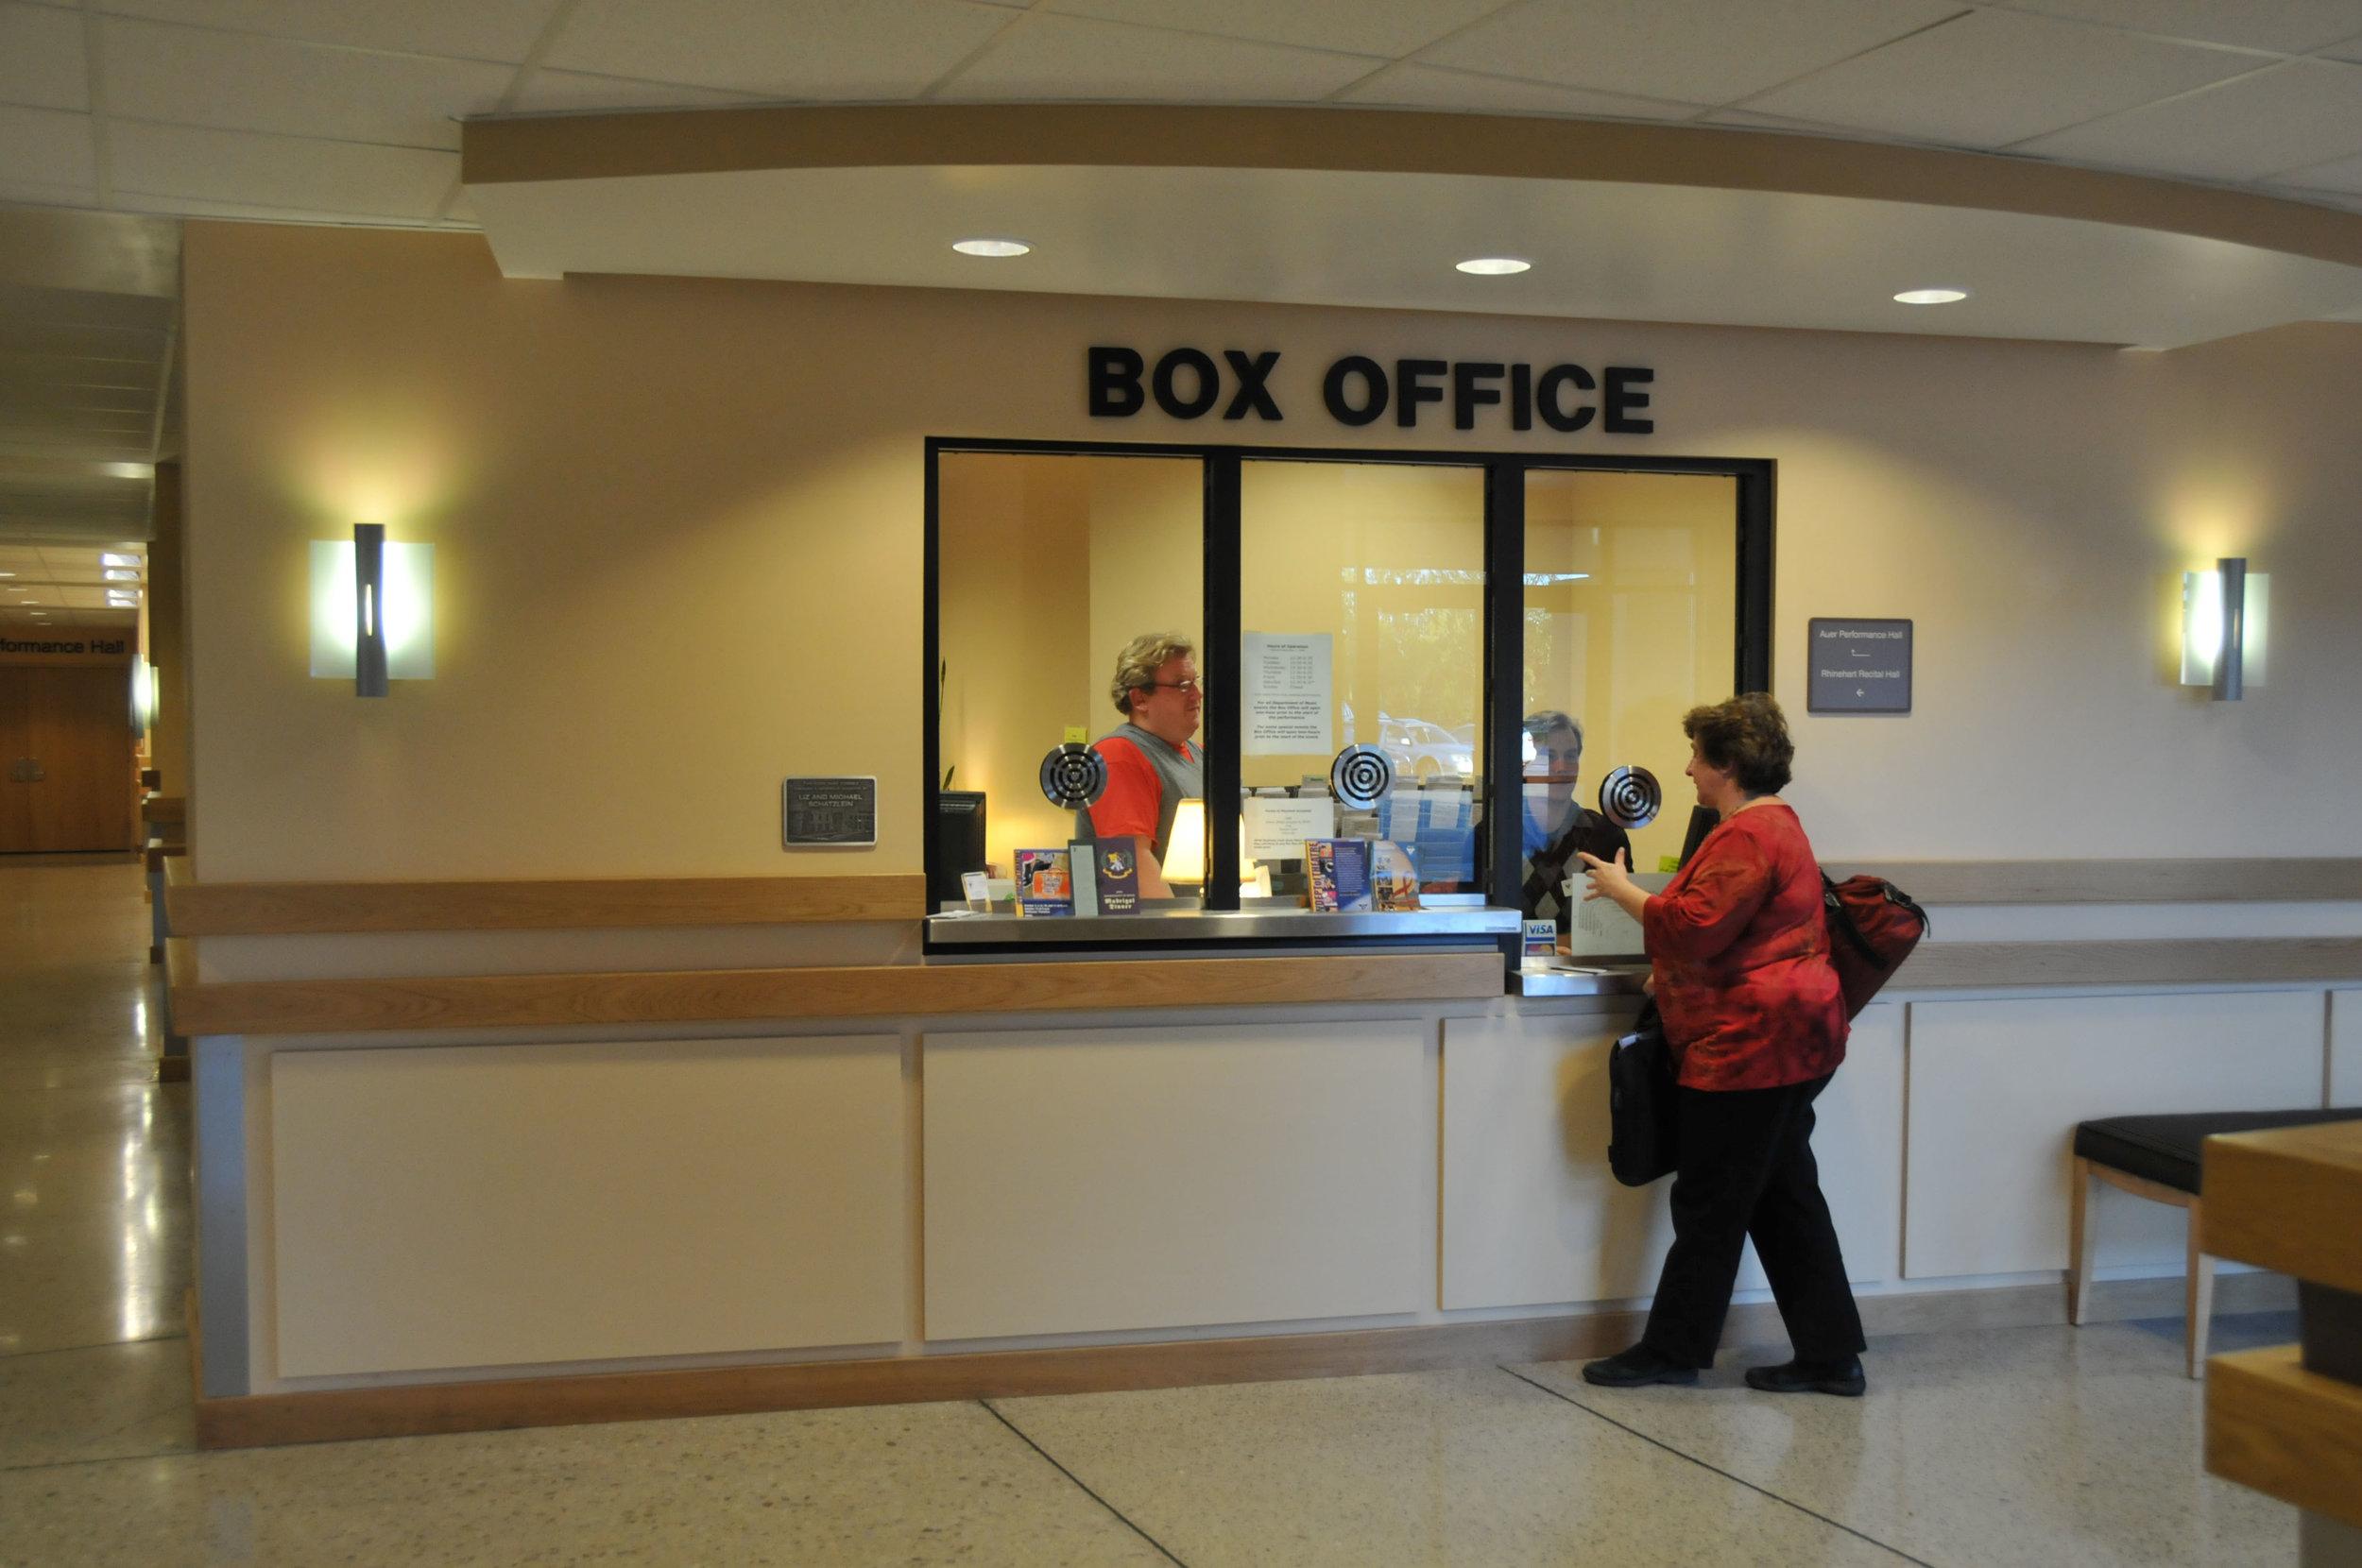 BoxOfficeHeader.jpg